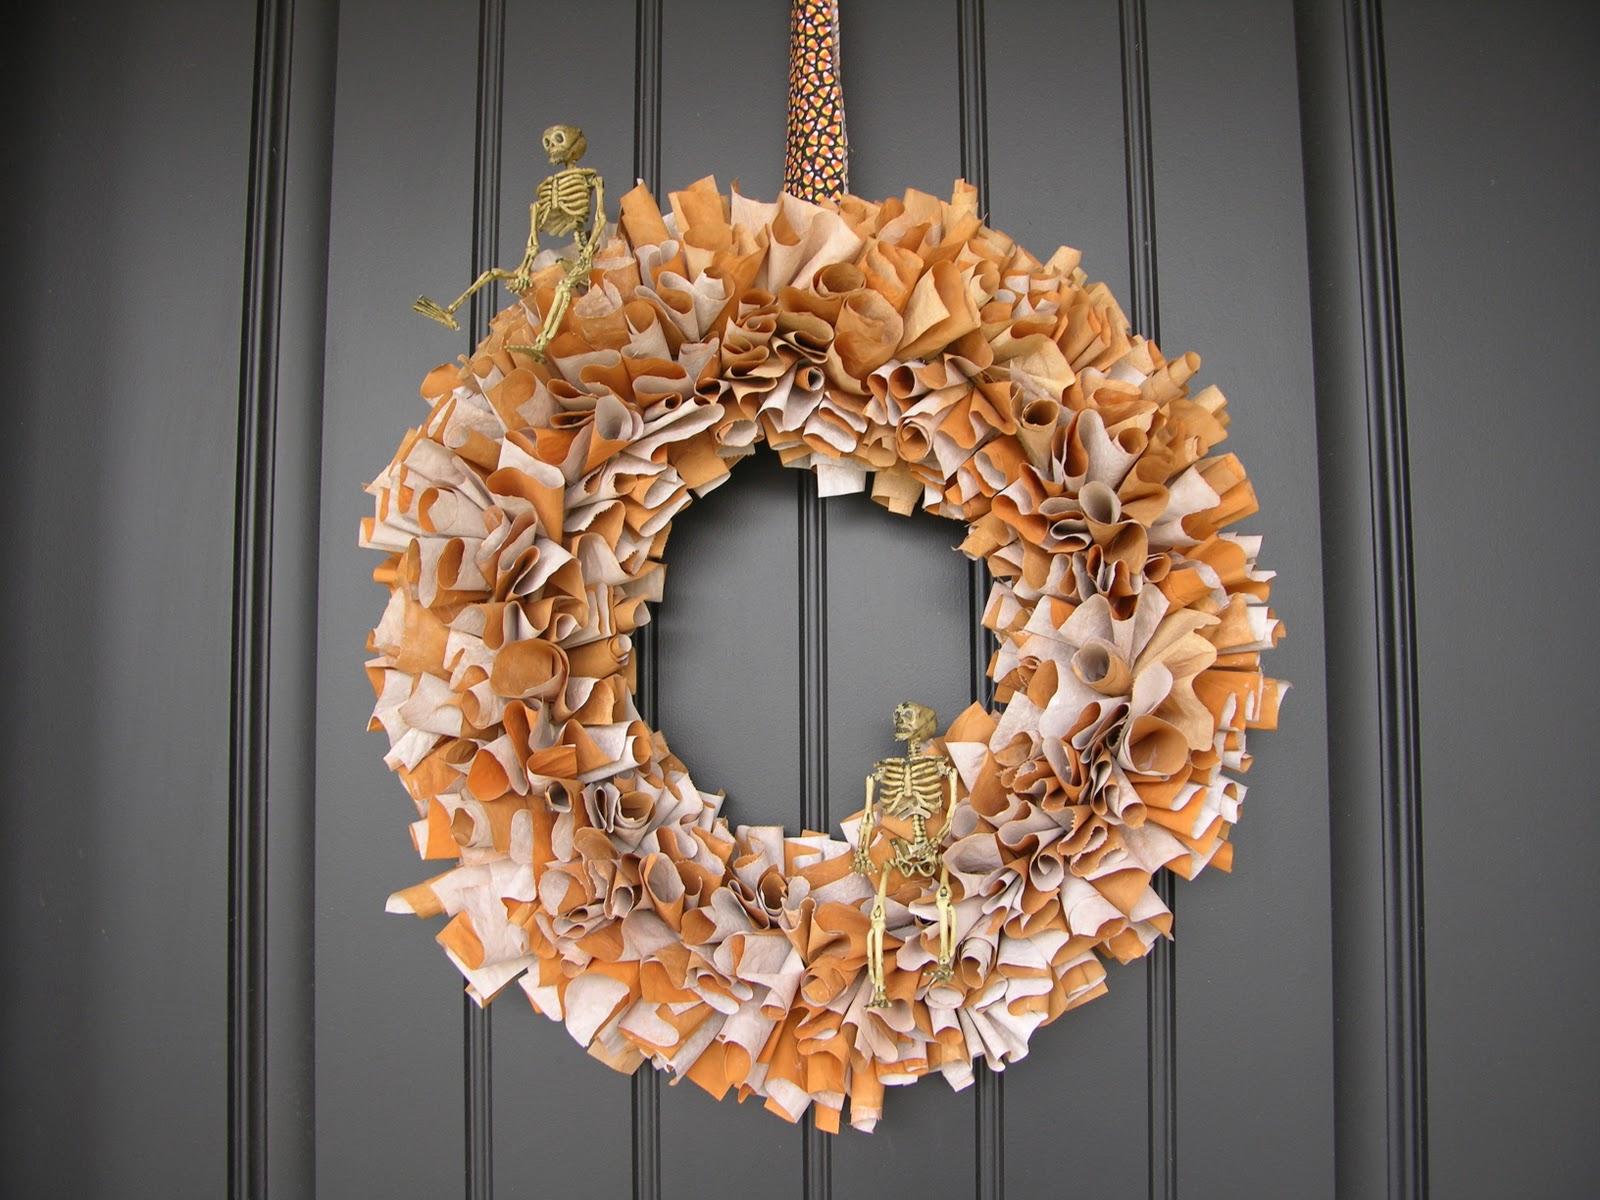 Spooky and Chic Halloween Wreath Design Ideas